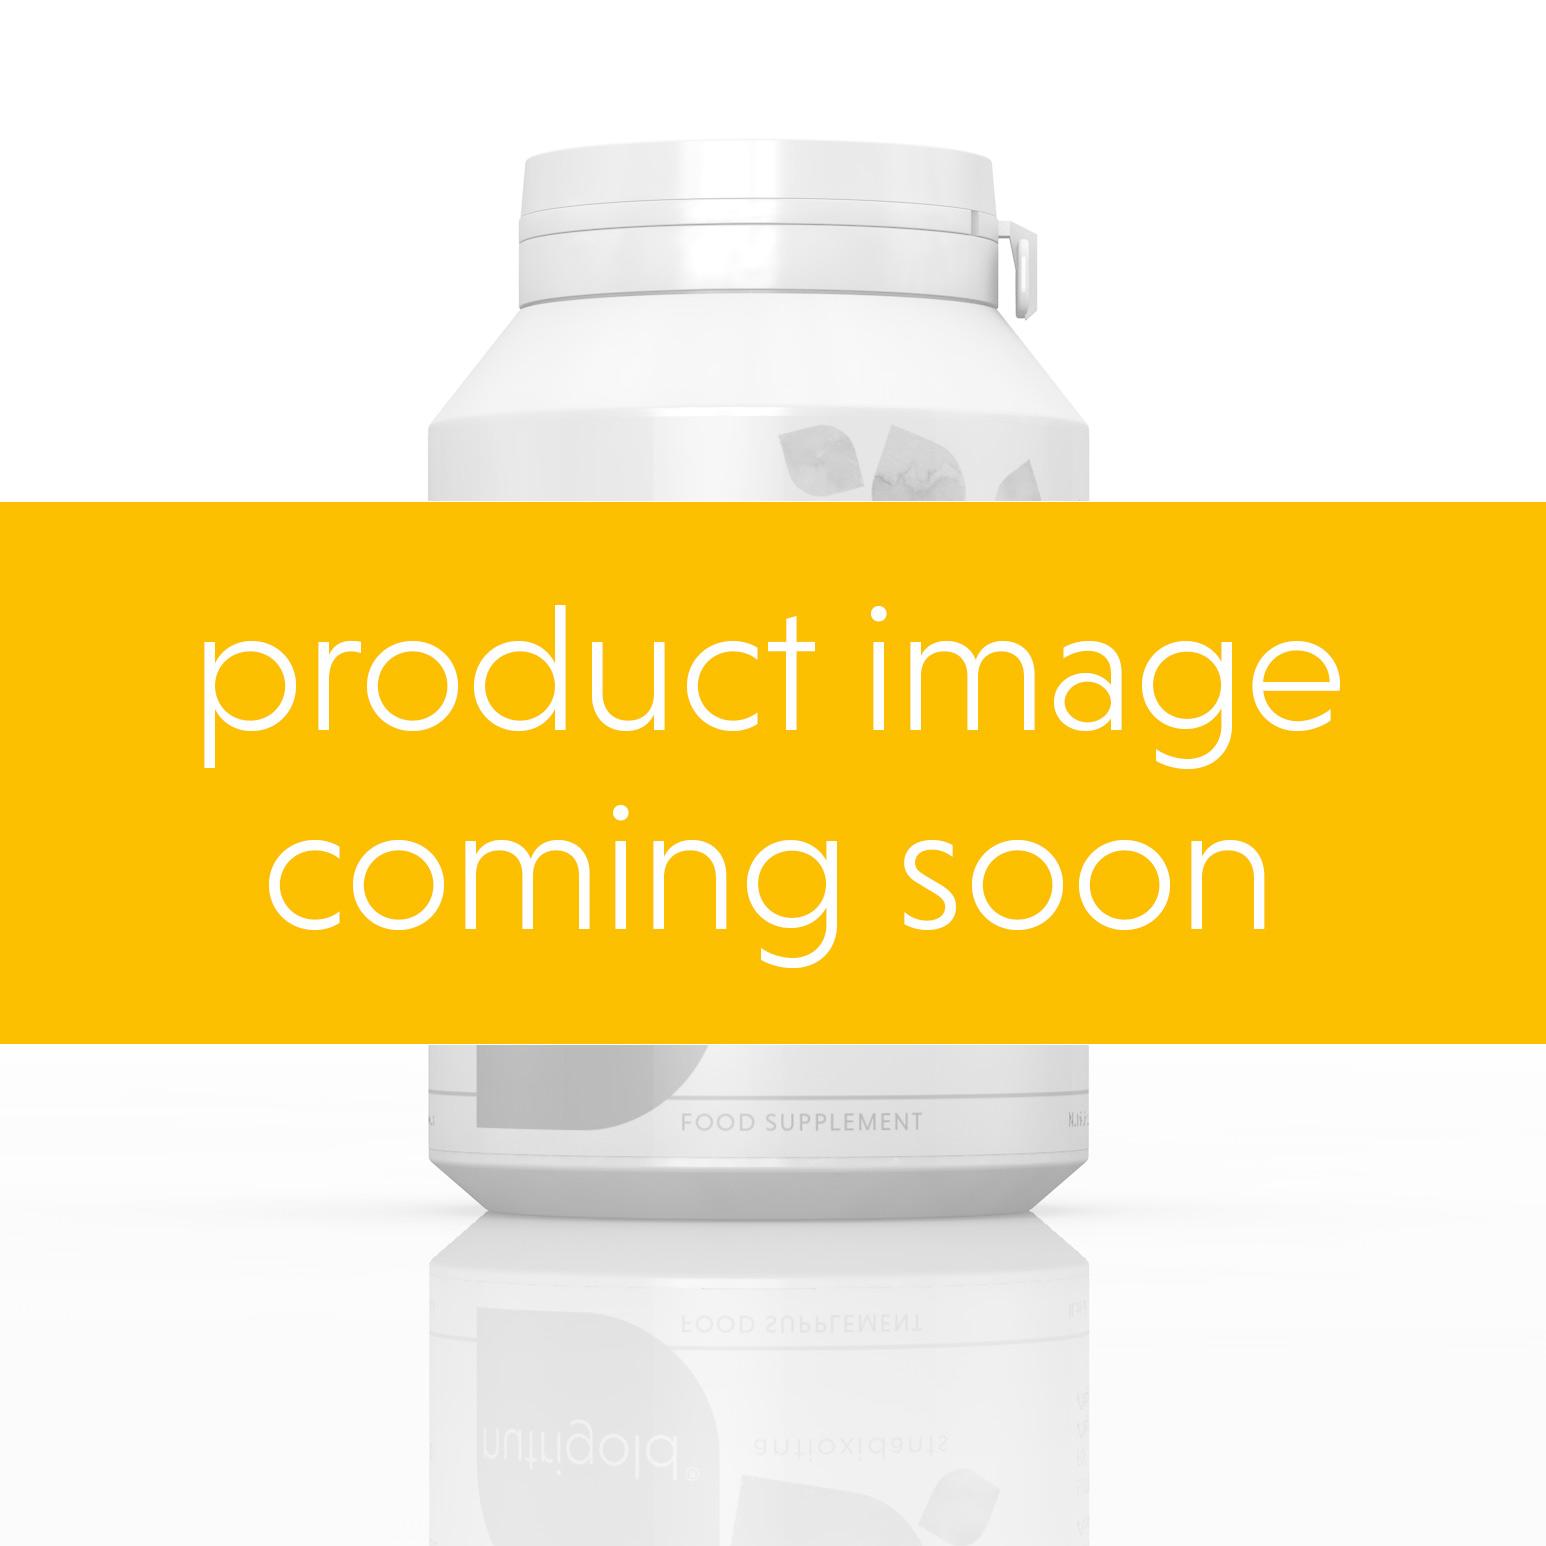 MULTIPACK: Vitamin B12 Sublingual MULTIPACK x 3 pots